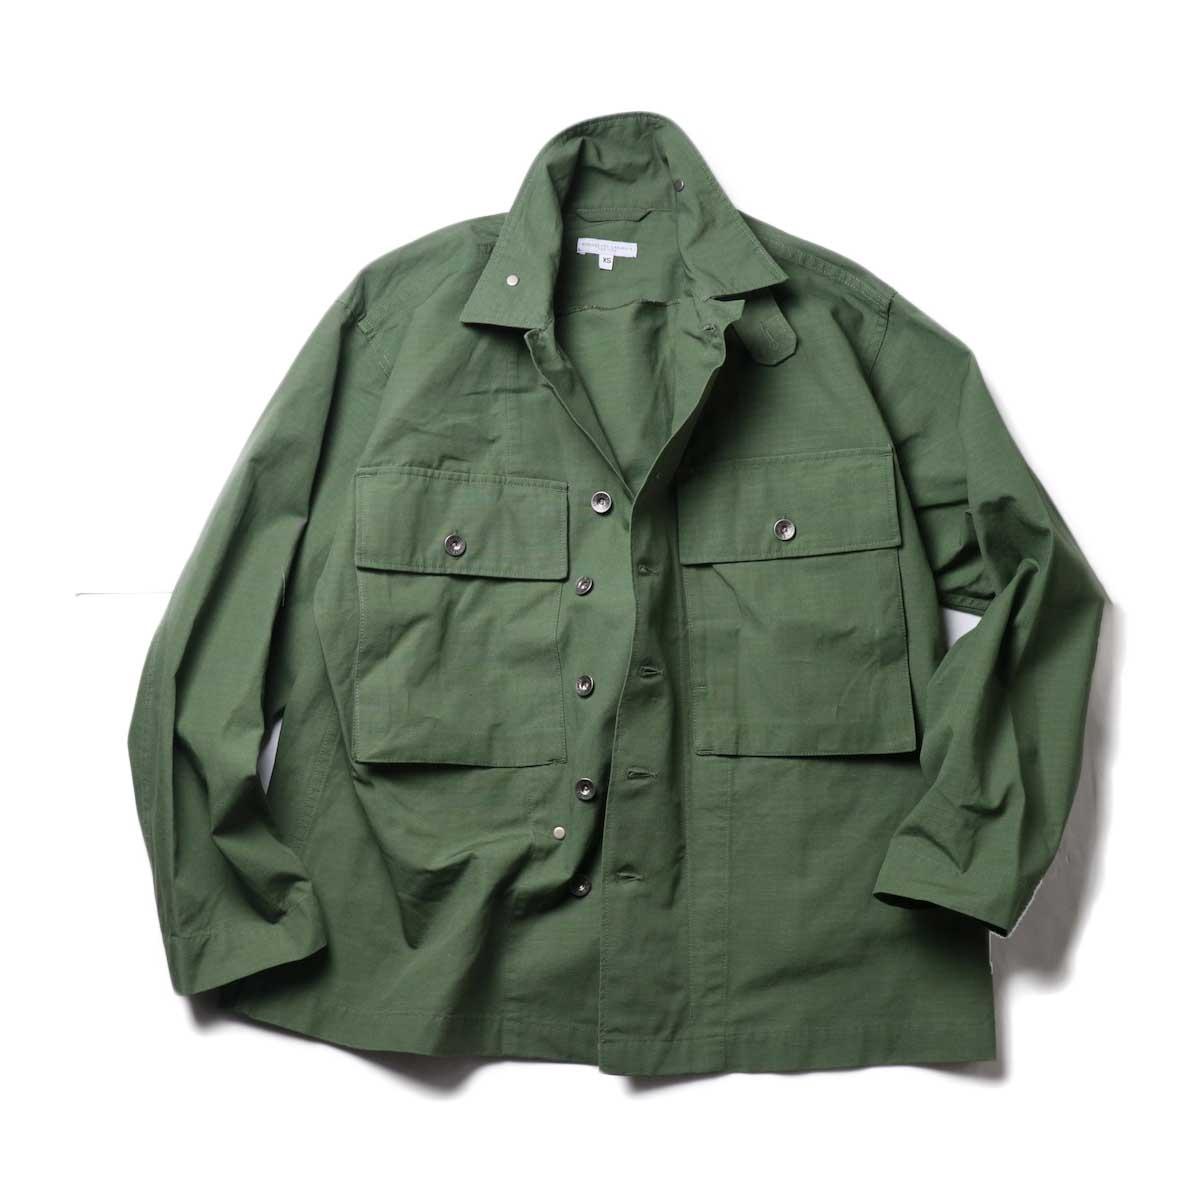 Engineered Garments / M43/2 Shirt Jacket -Cotton Ripstop (Olive)ボタン開けた場合